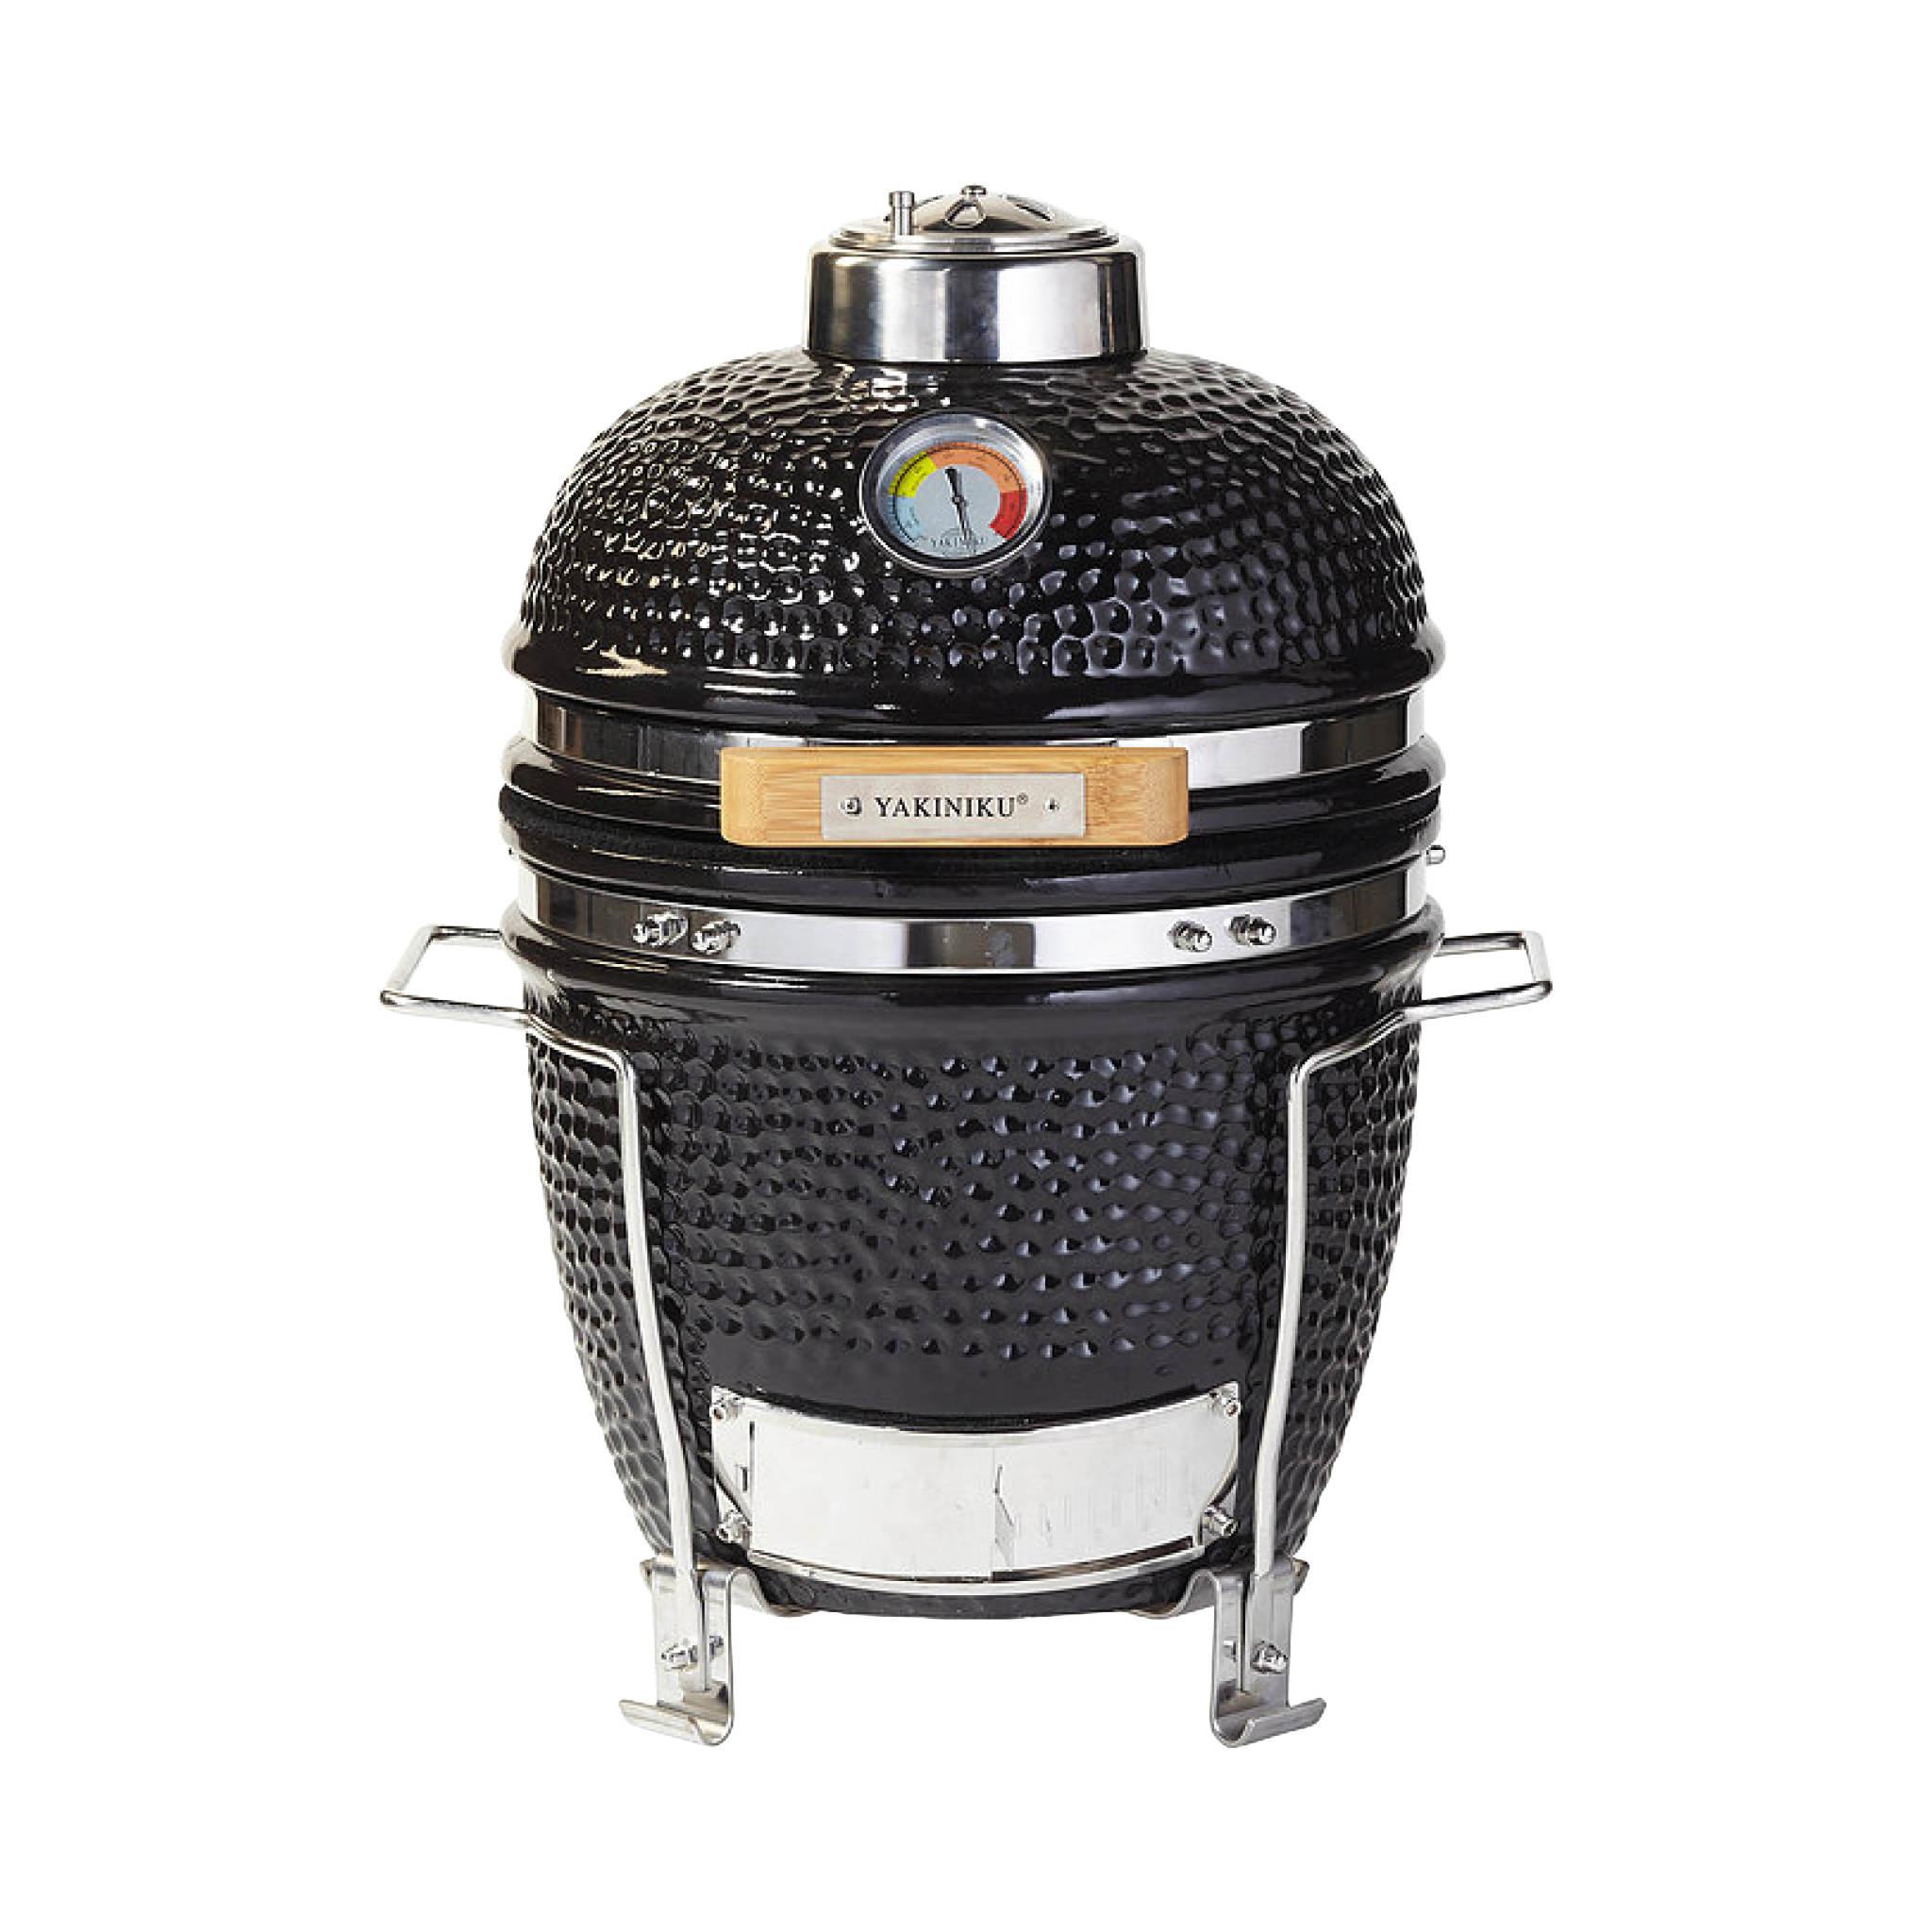 Yakiniku Barbecue Keramisch met Onderstel 11''